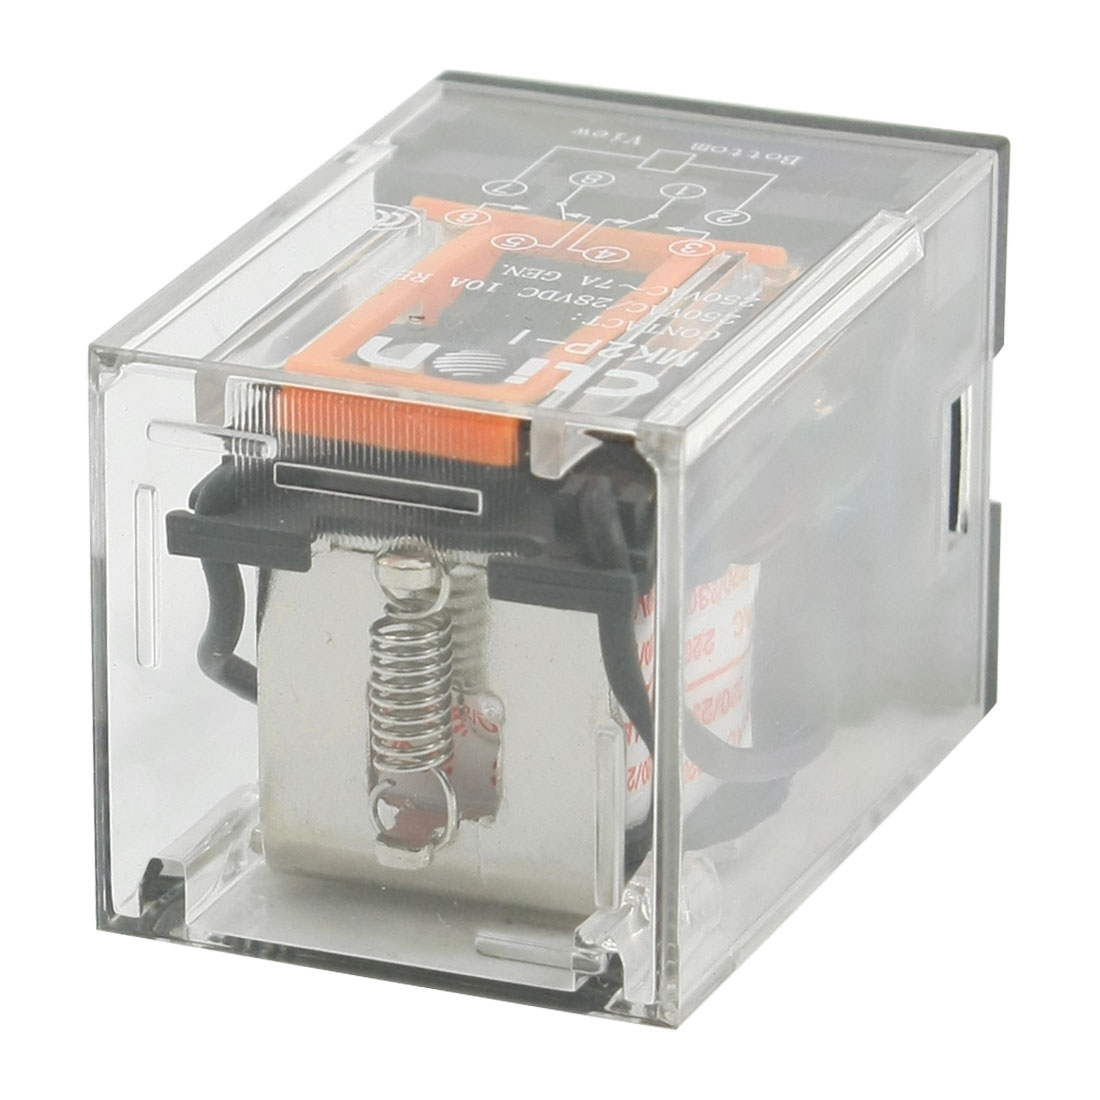 Aliexpresscom  Buy AC V V Coil Voltage PCB Power Relay - Relay coil voltage 220v